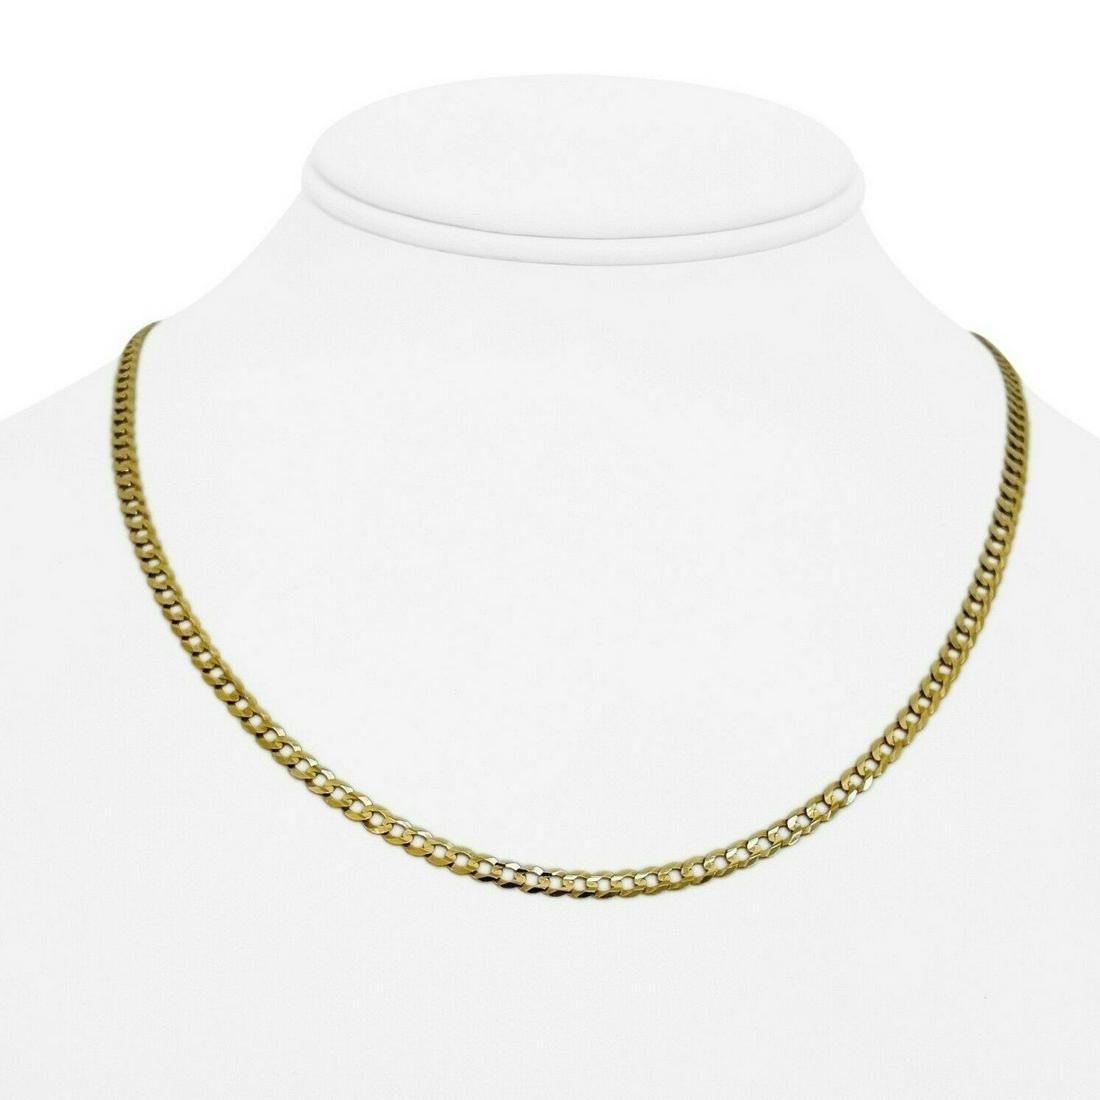 4k Yellow Gold 6.9g Thin Flat 3.5mm Curb Link Chain